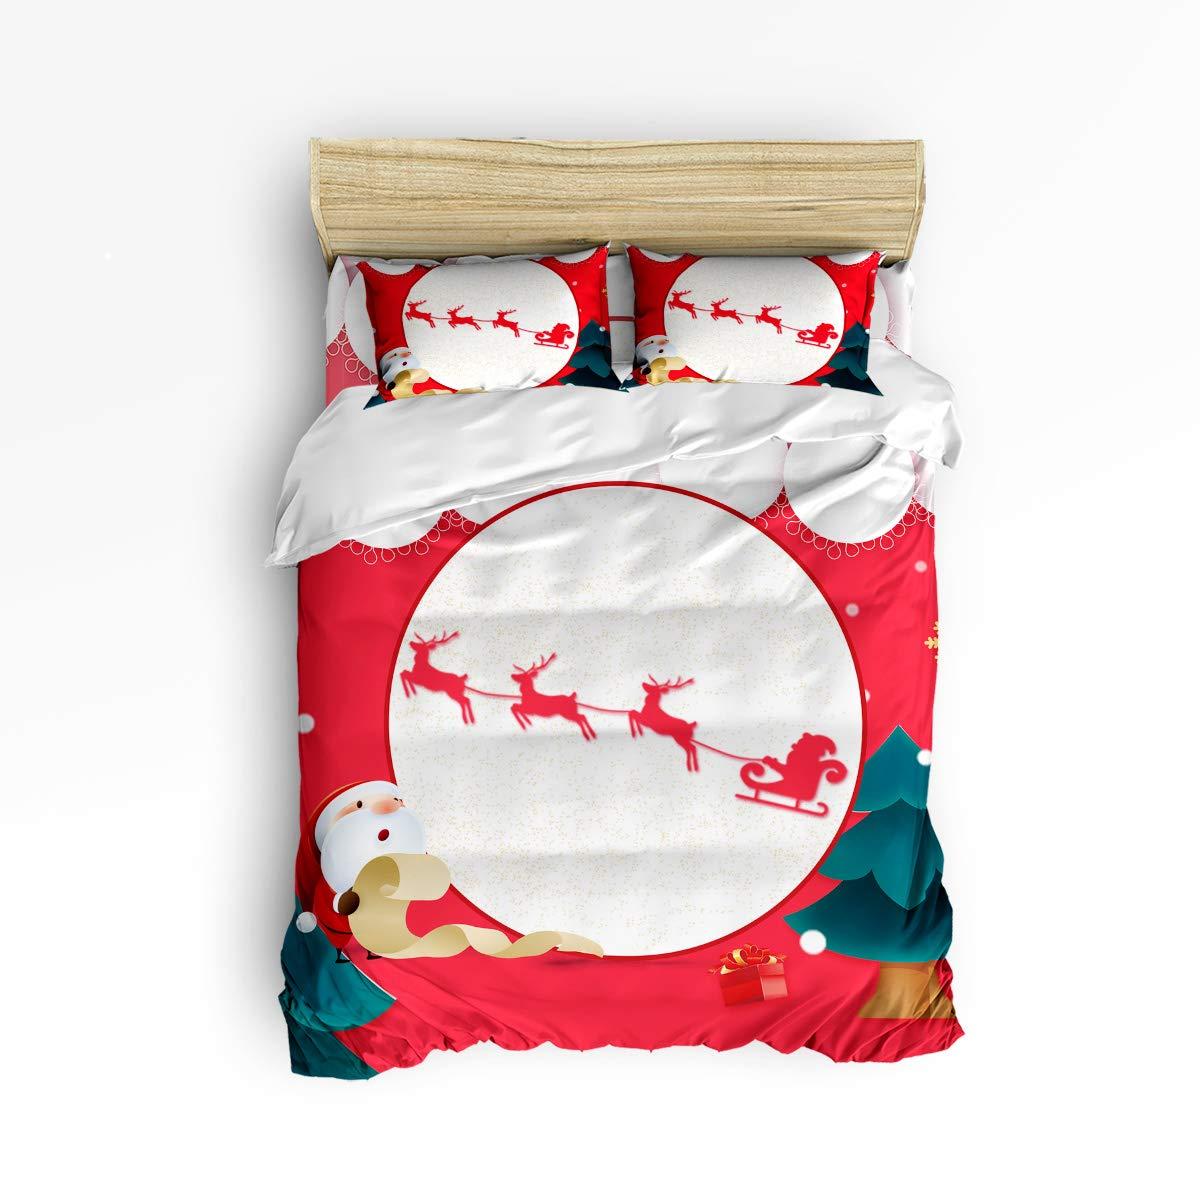 Z&L Home 寝具4点セット 掛け布団カバーセット 赤 クリスマス サンタクロース スレッド フルムーン ラグジュアリー ソフト フラット シーツセット 装飾的 枕カバー ティーン 女の子 男の子 男性 女性 子供 フル 1026WEFHUVLYX3I#SF2SWTQ00472SJTBZLH B07JR113X2 Santaclaus29 フル